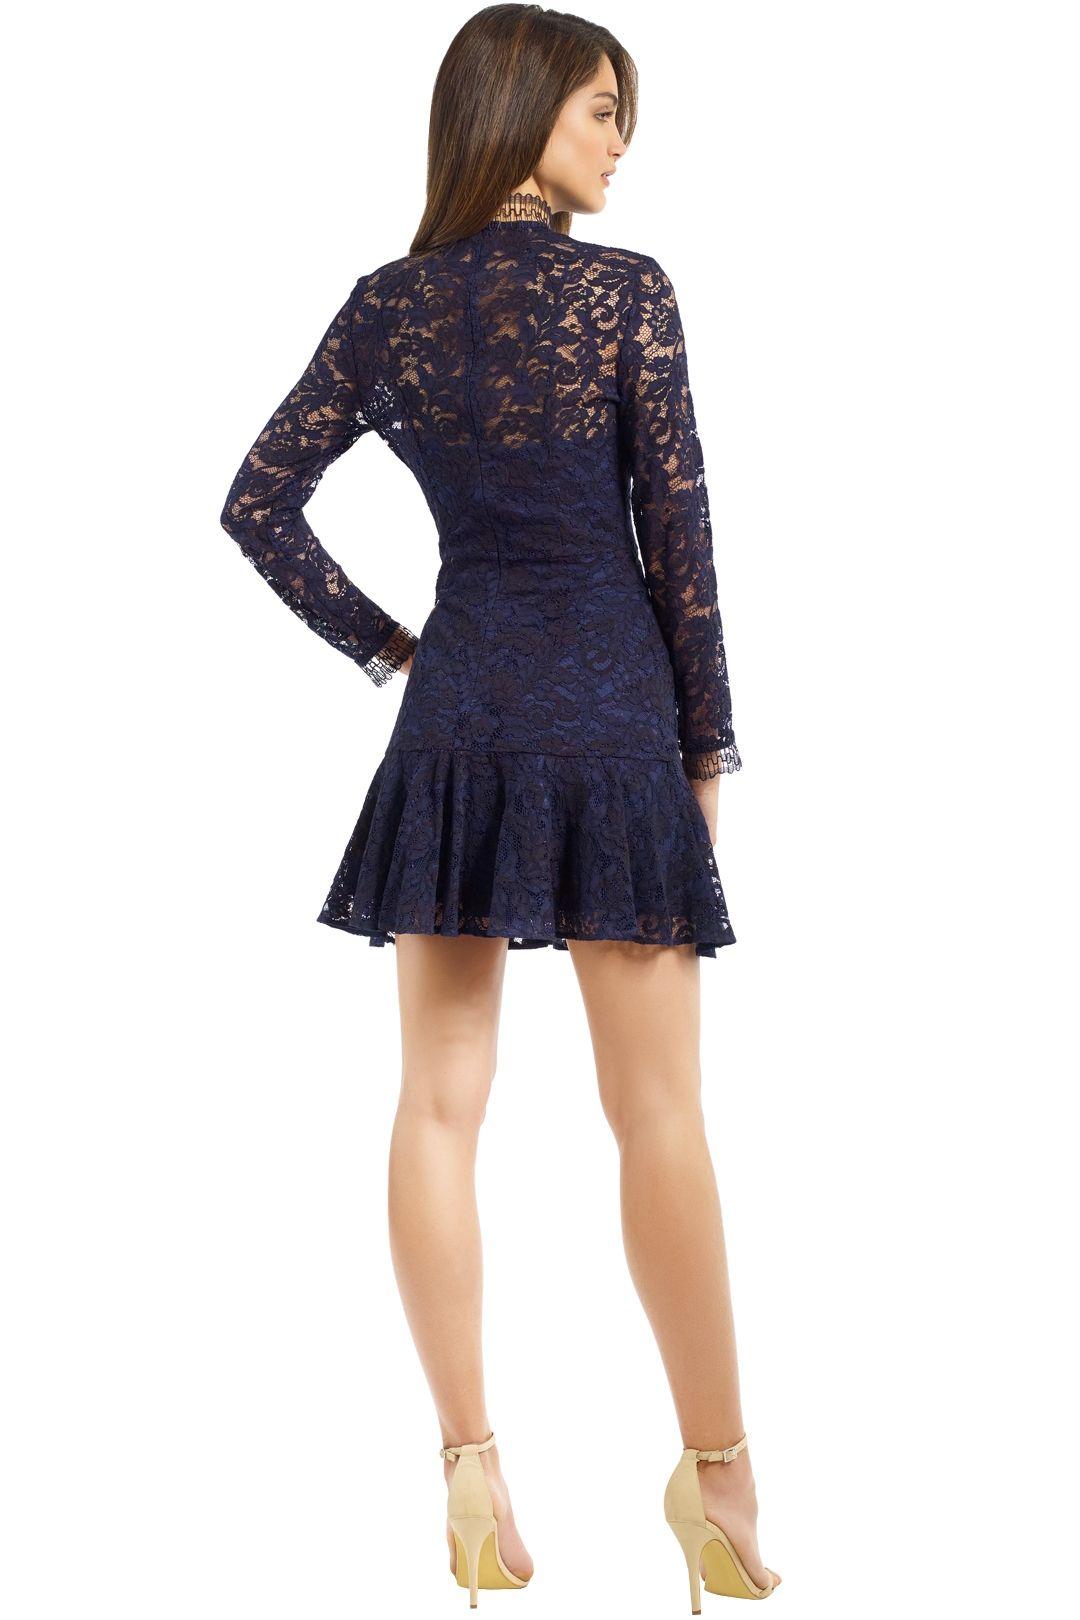 Lover - Cecilia Mini Dress - Navy - Back